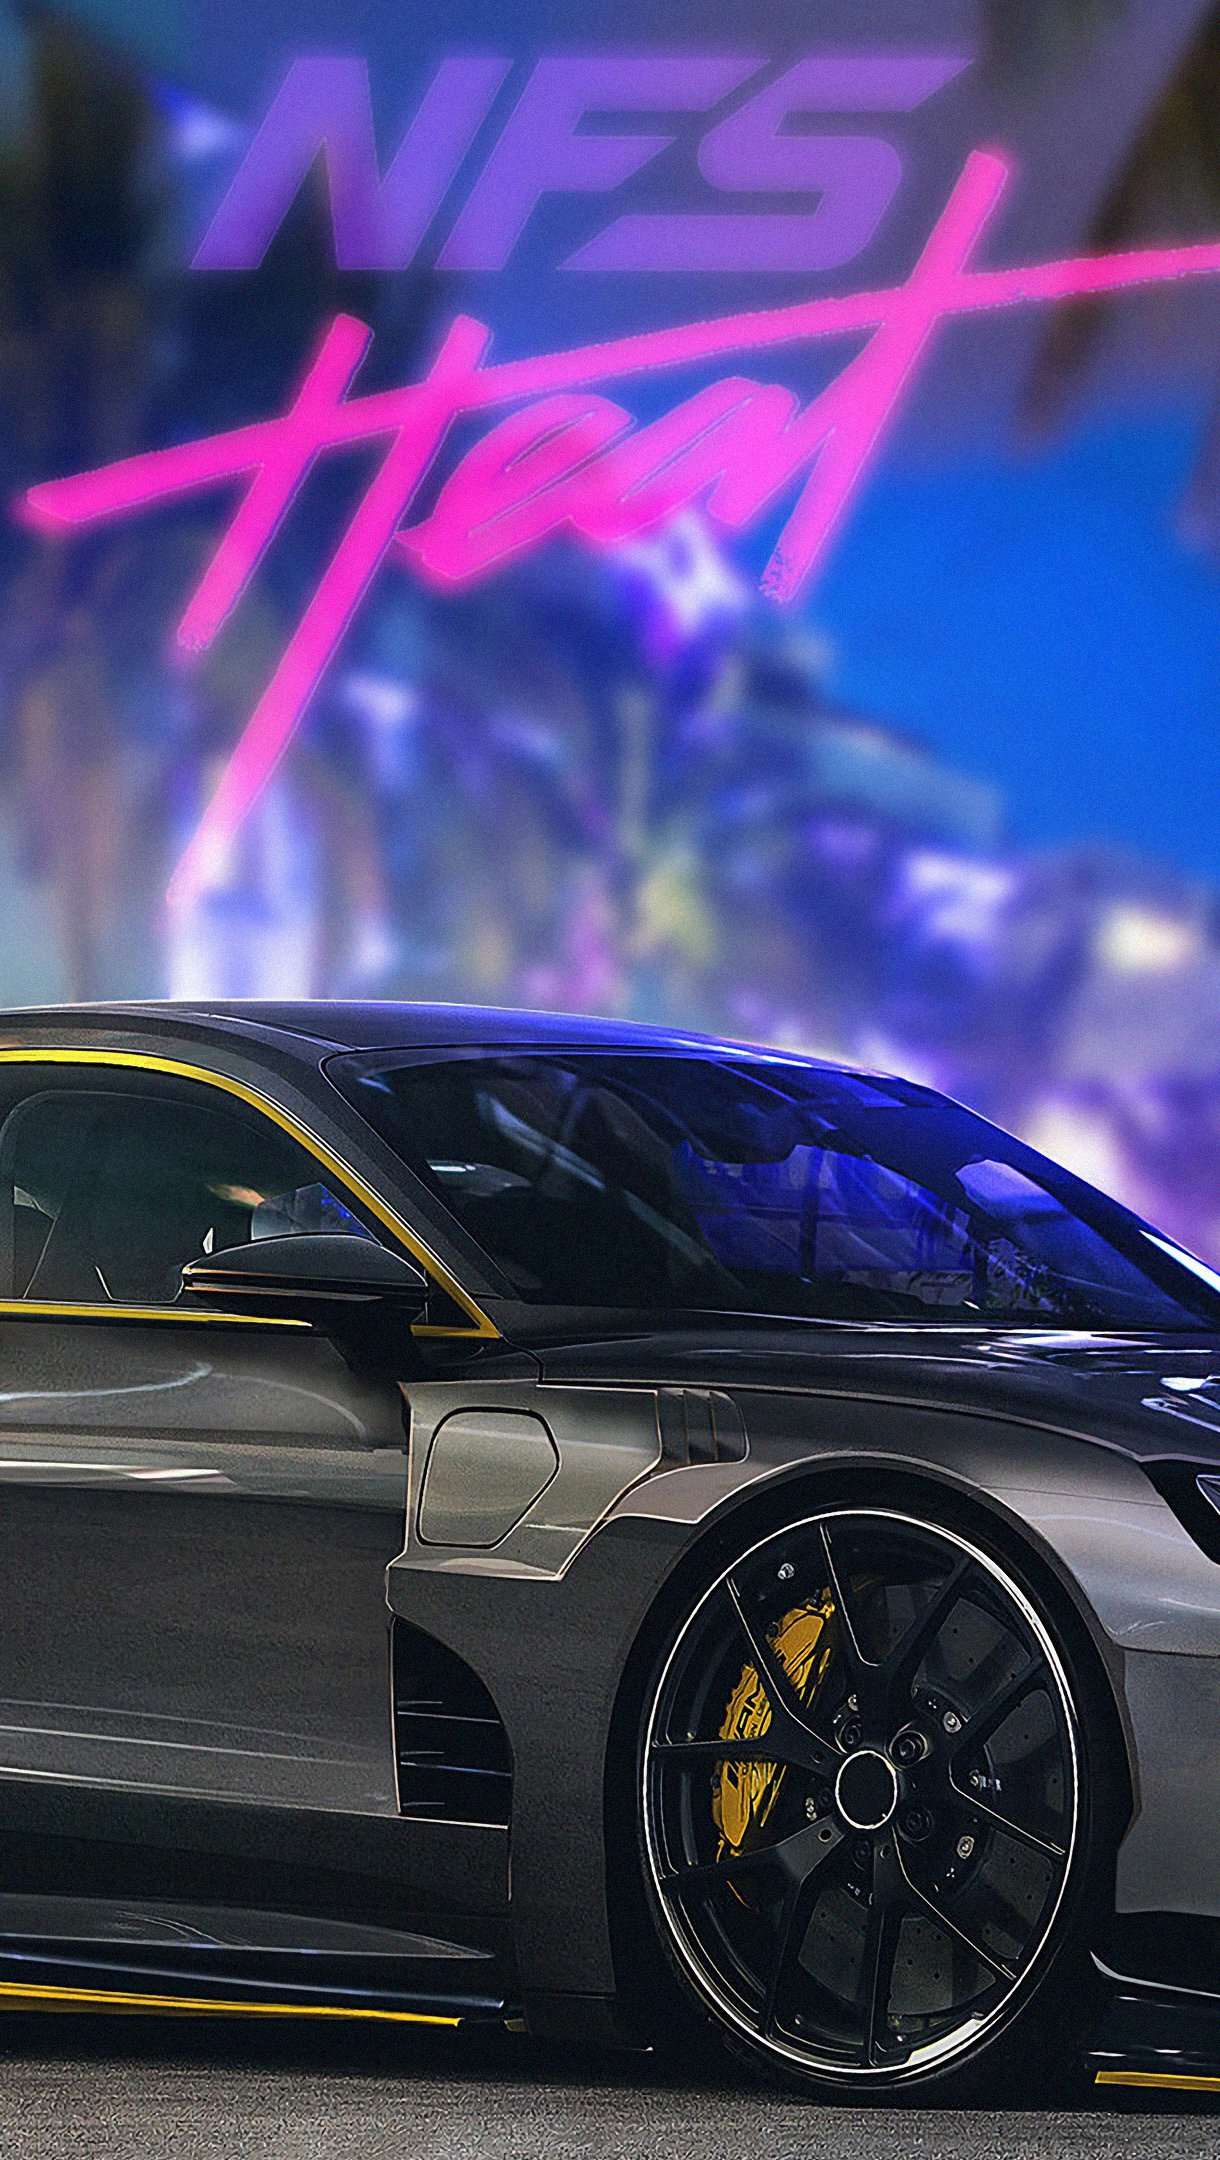 Fondos de pantalla Audi E-TRON NFS Heat Vertical